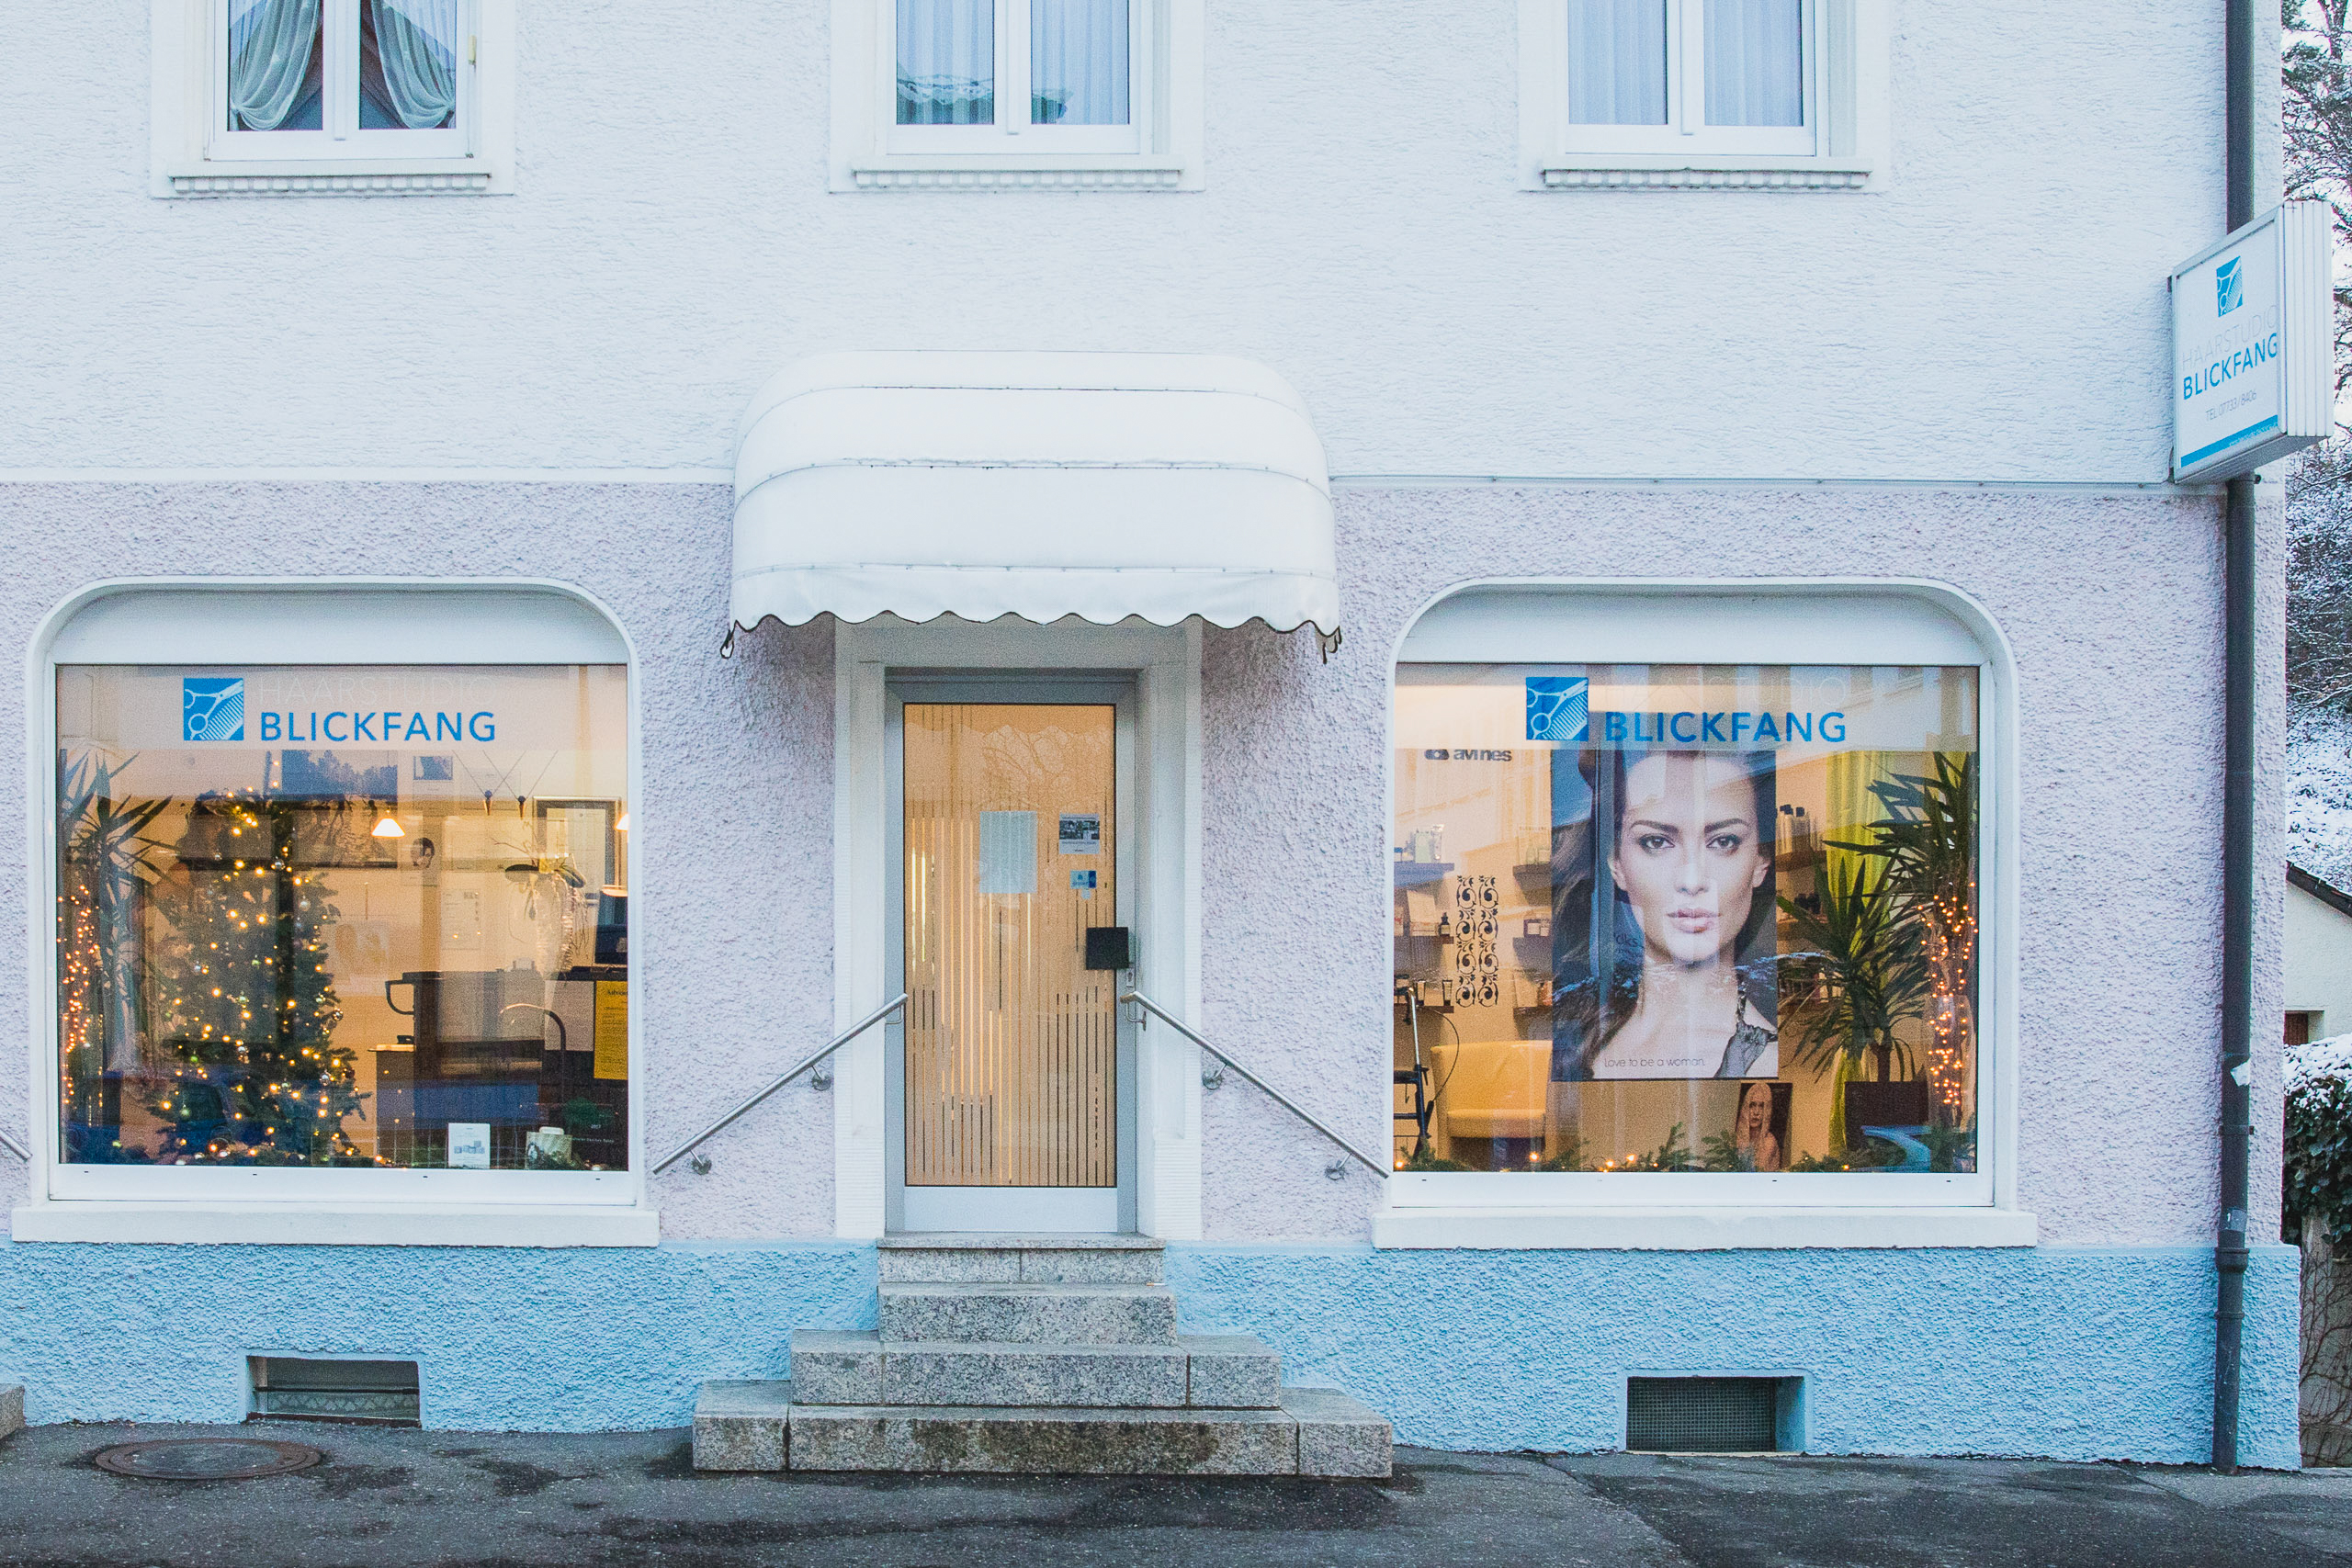 Haarstudio Blickfang Außenansicht